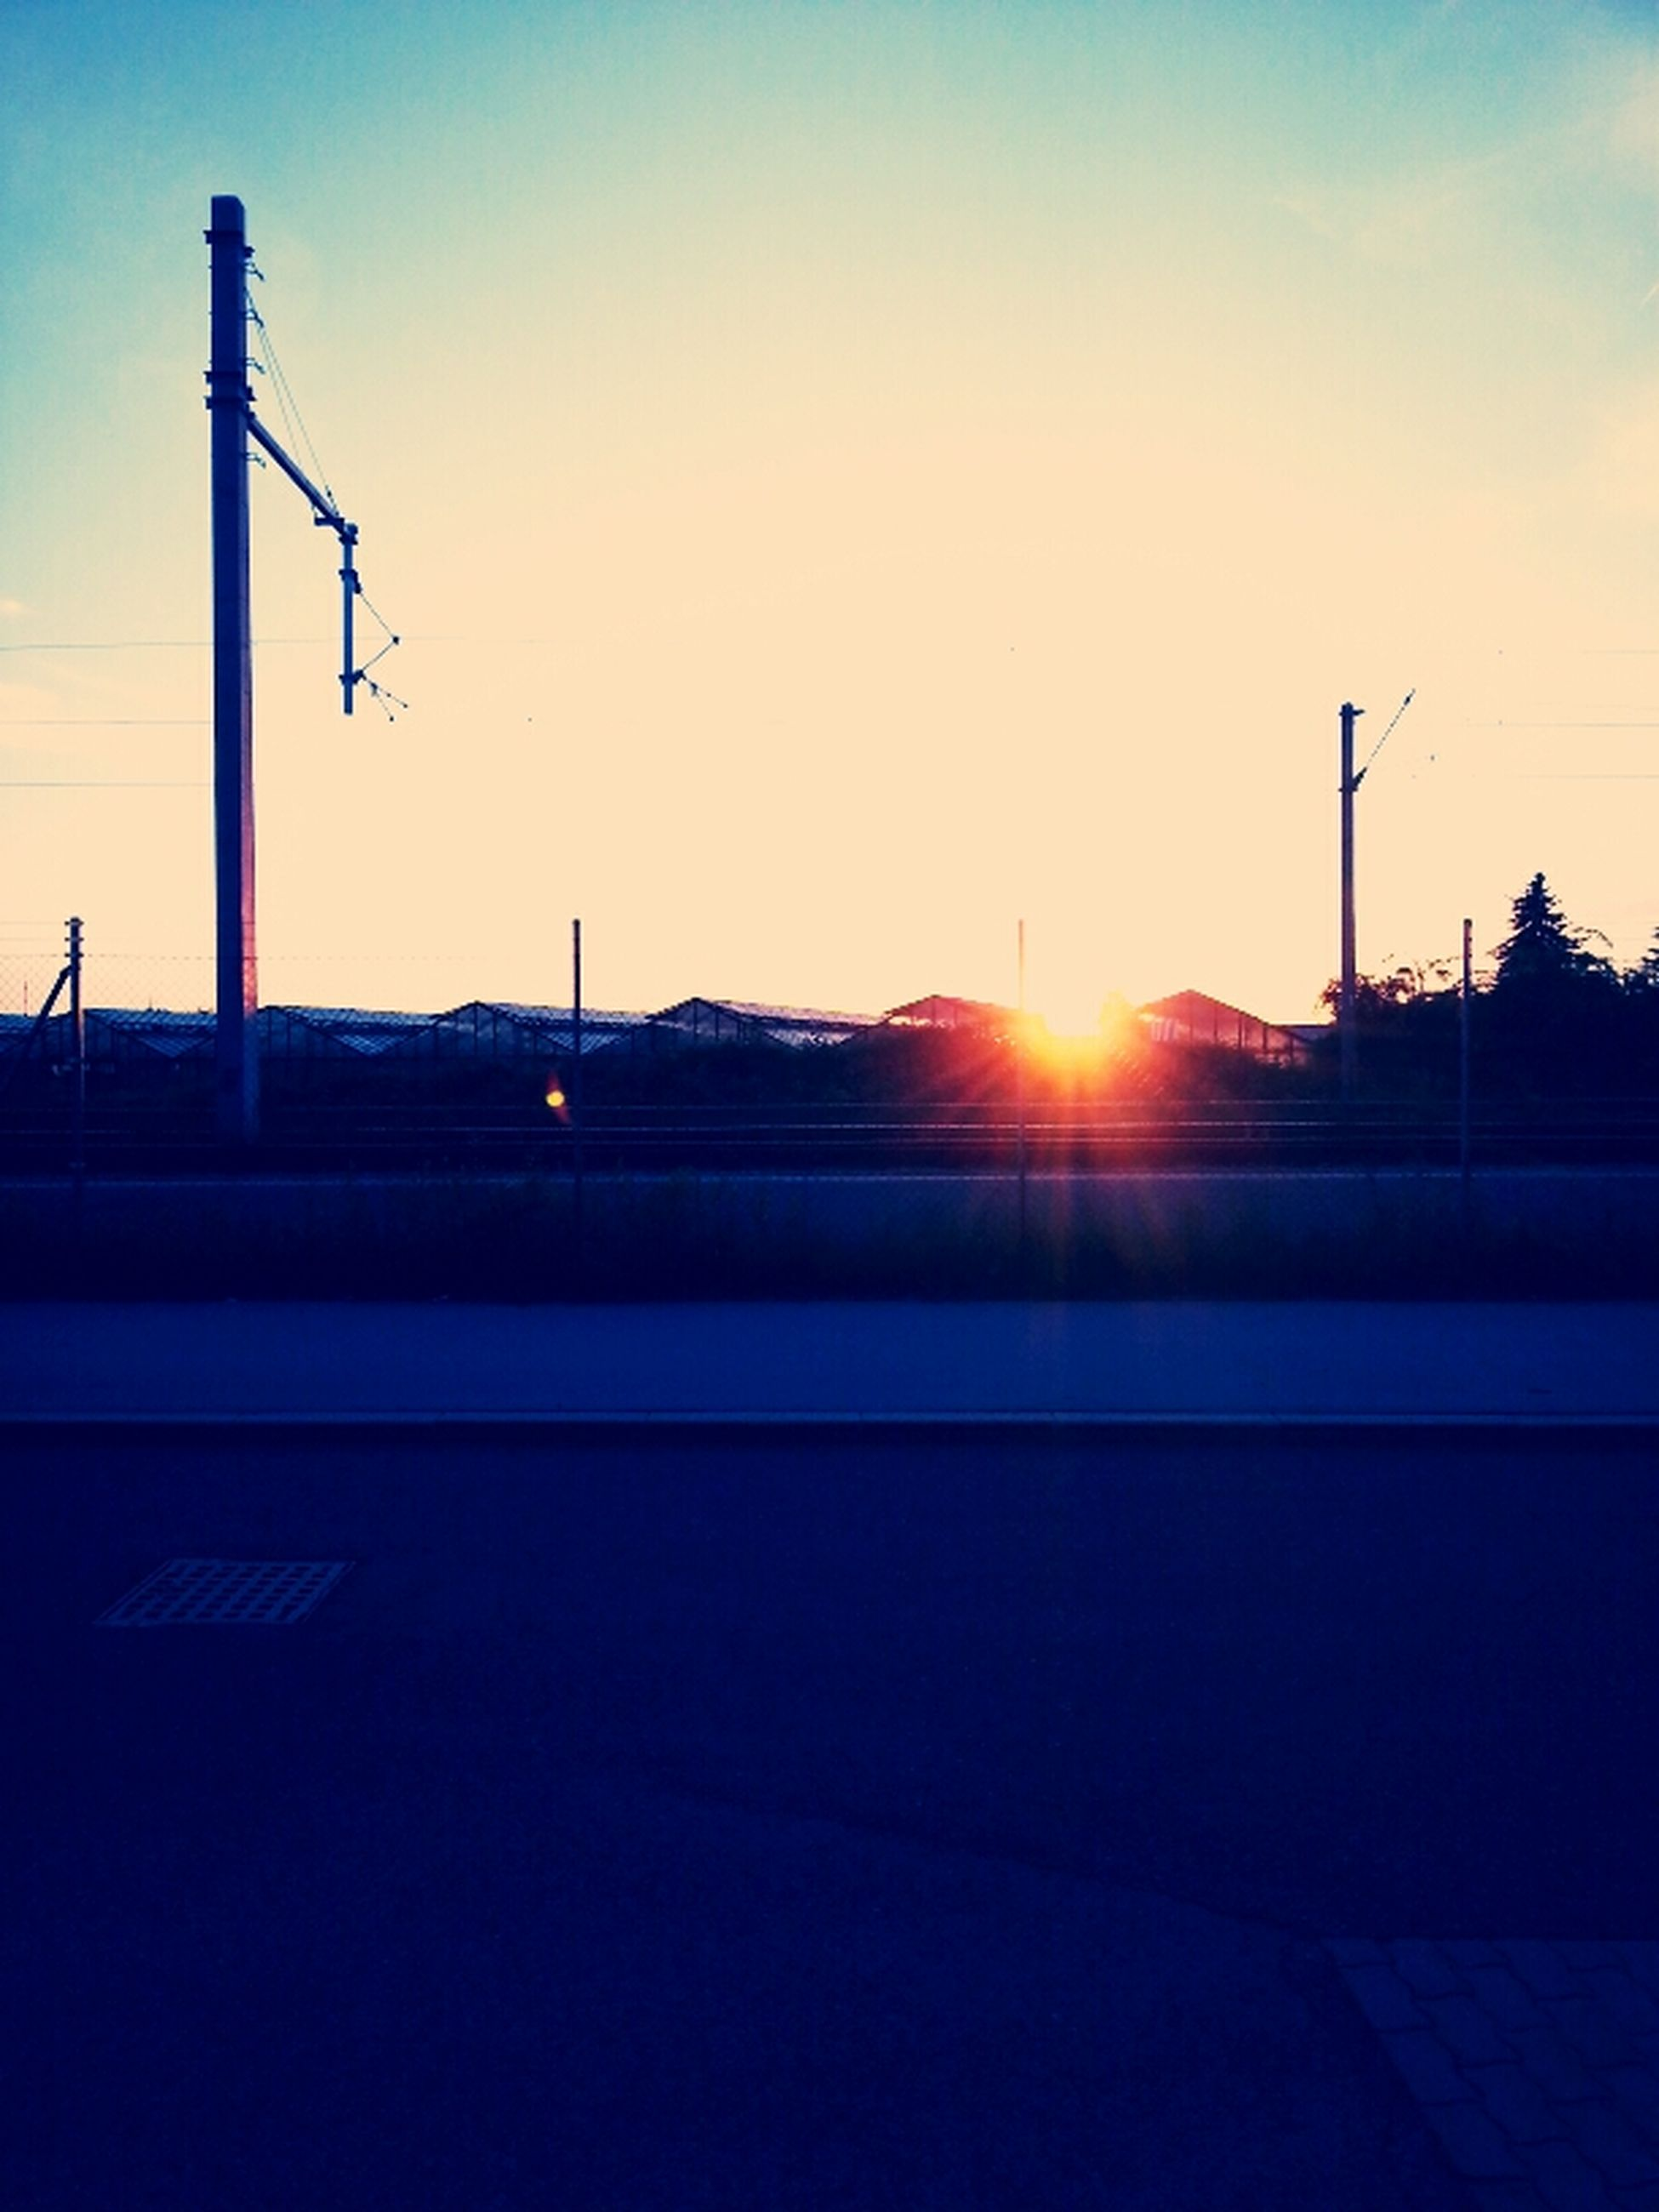 sunset, sun, silhouette, street light, sunlight, orange color, sunbeam, sky, lens flare, clear sky, transportation, road, electricity pylon, built structure, copy space, building exterior, street, back lit, nature, outdoors